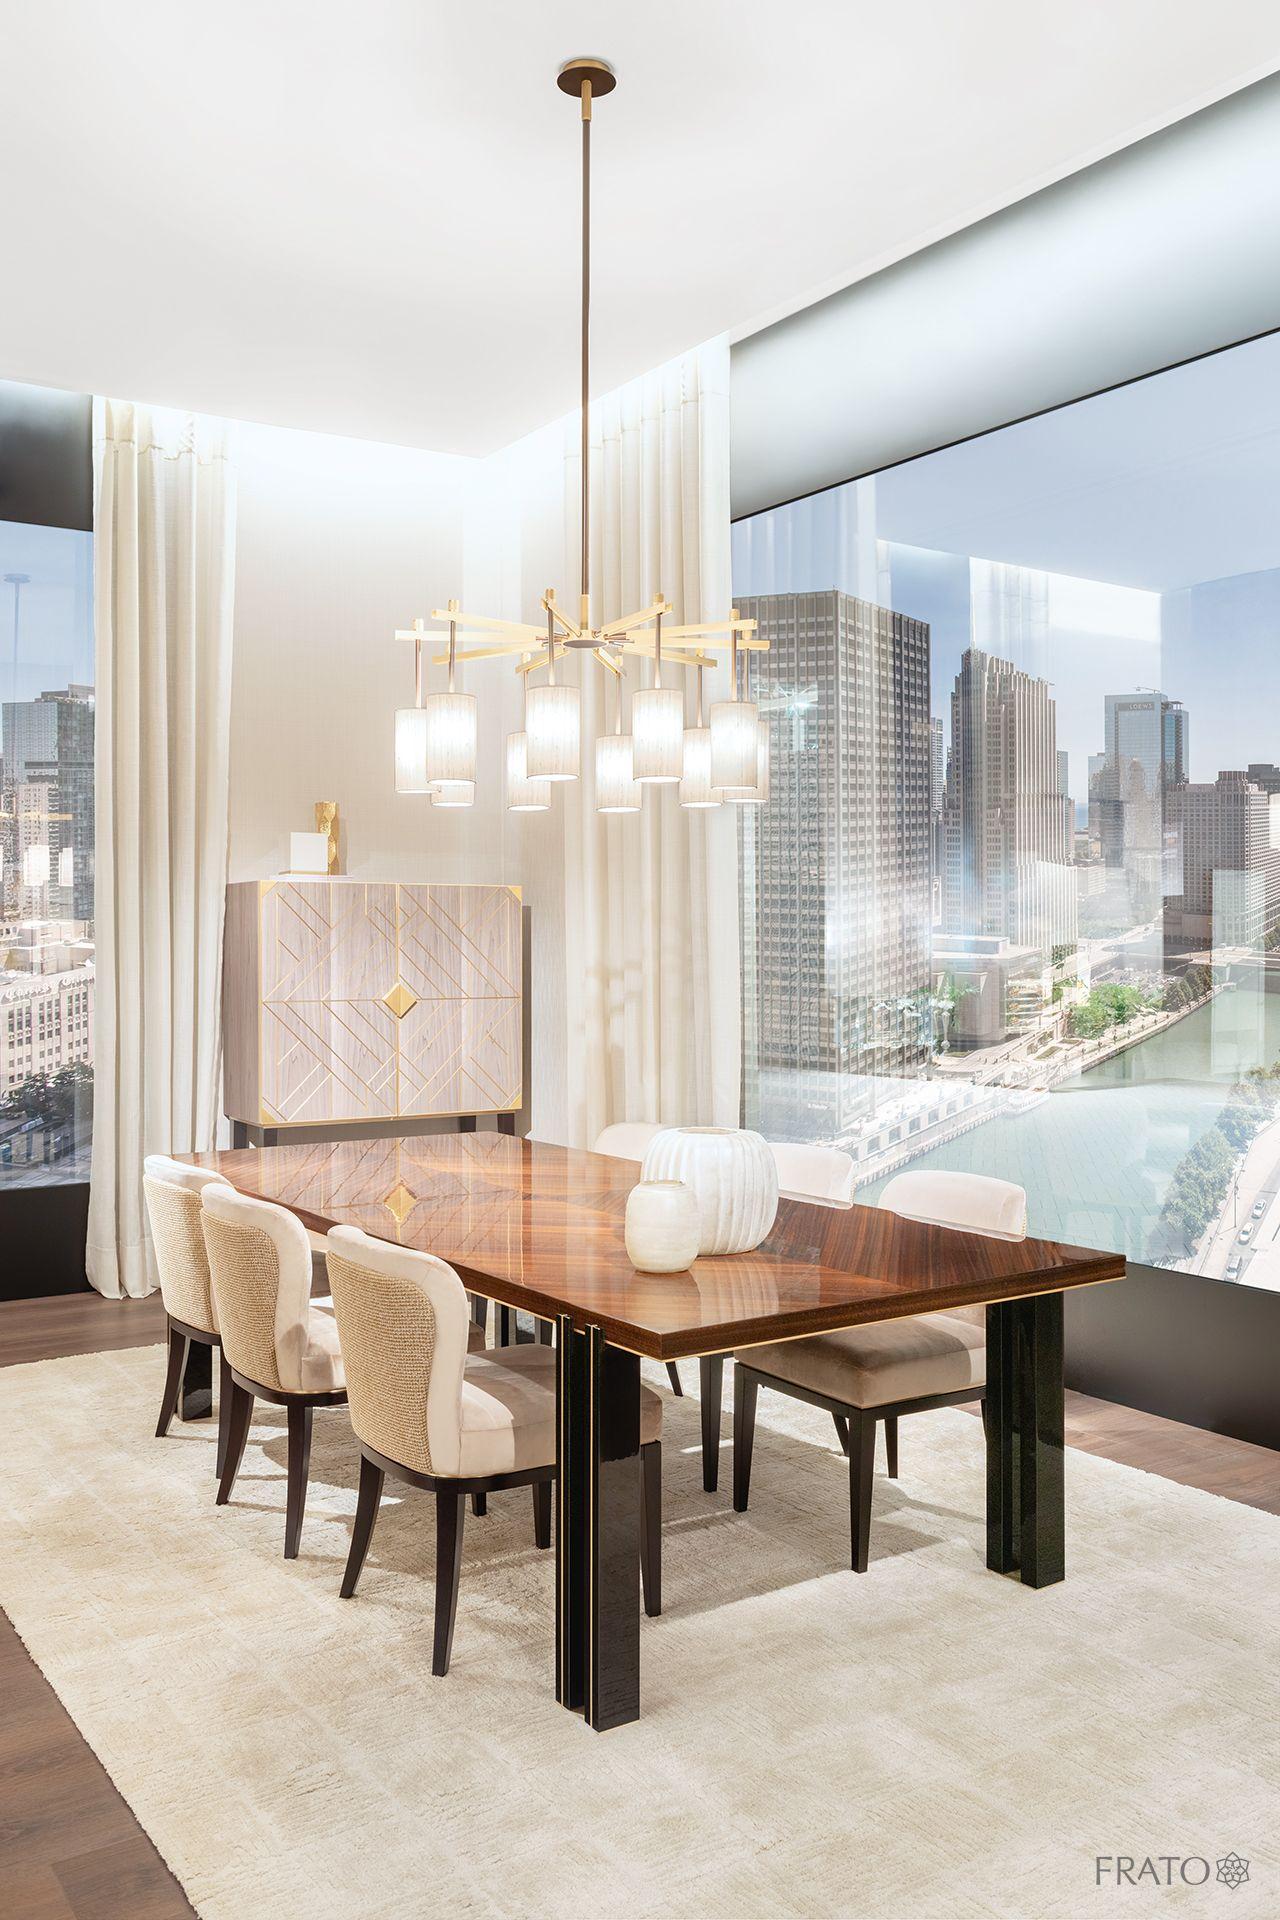 Frato S Elegant Interiors At Maison Objet Paris January 2019 Www